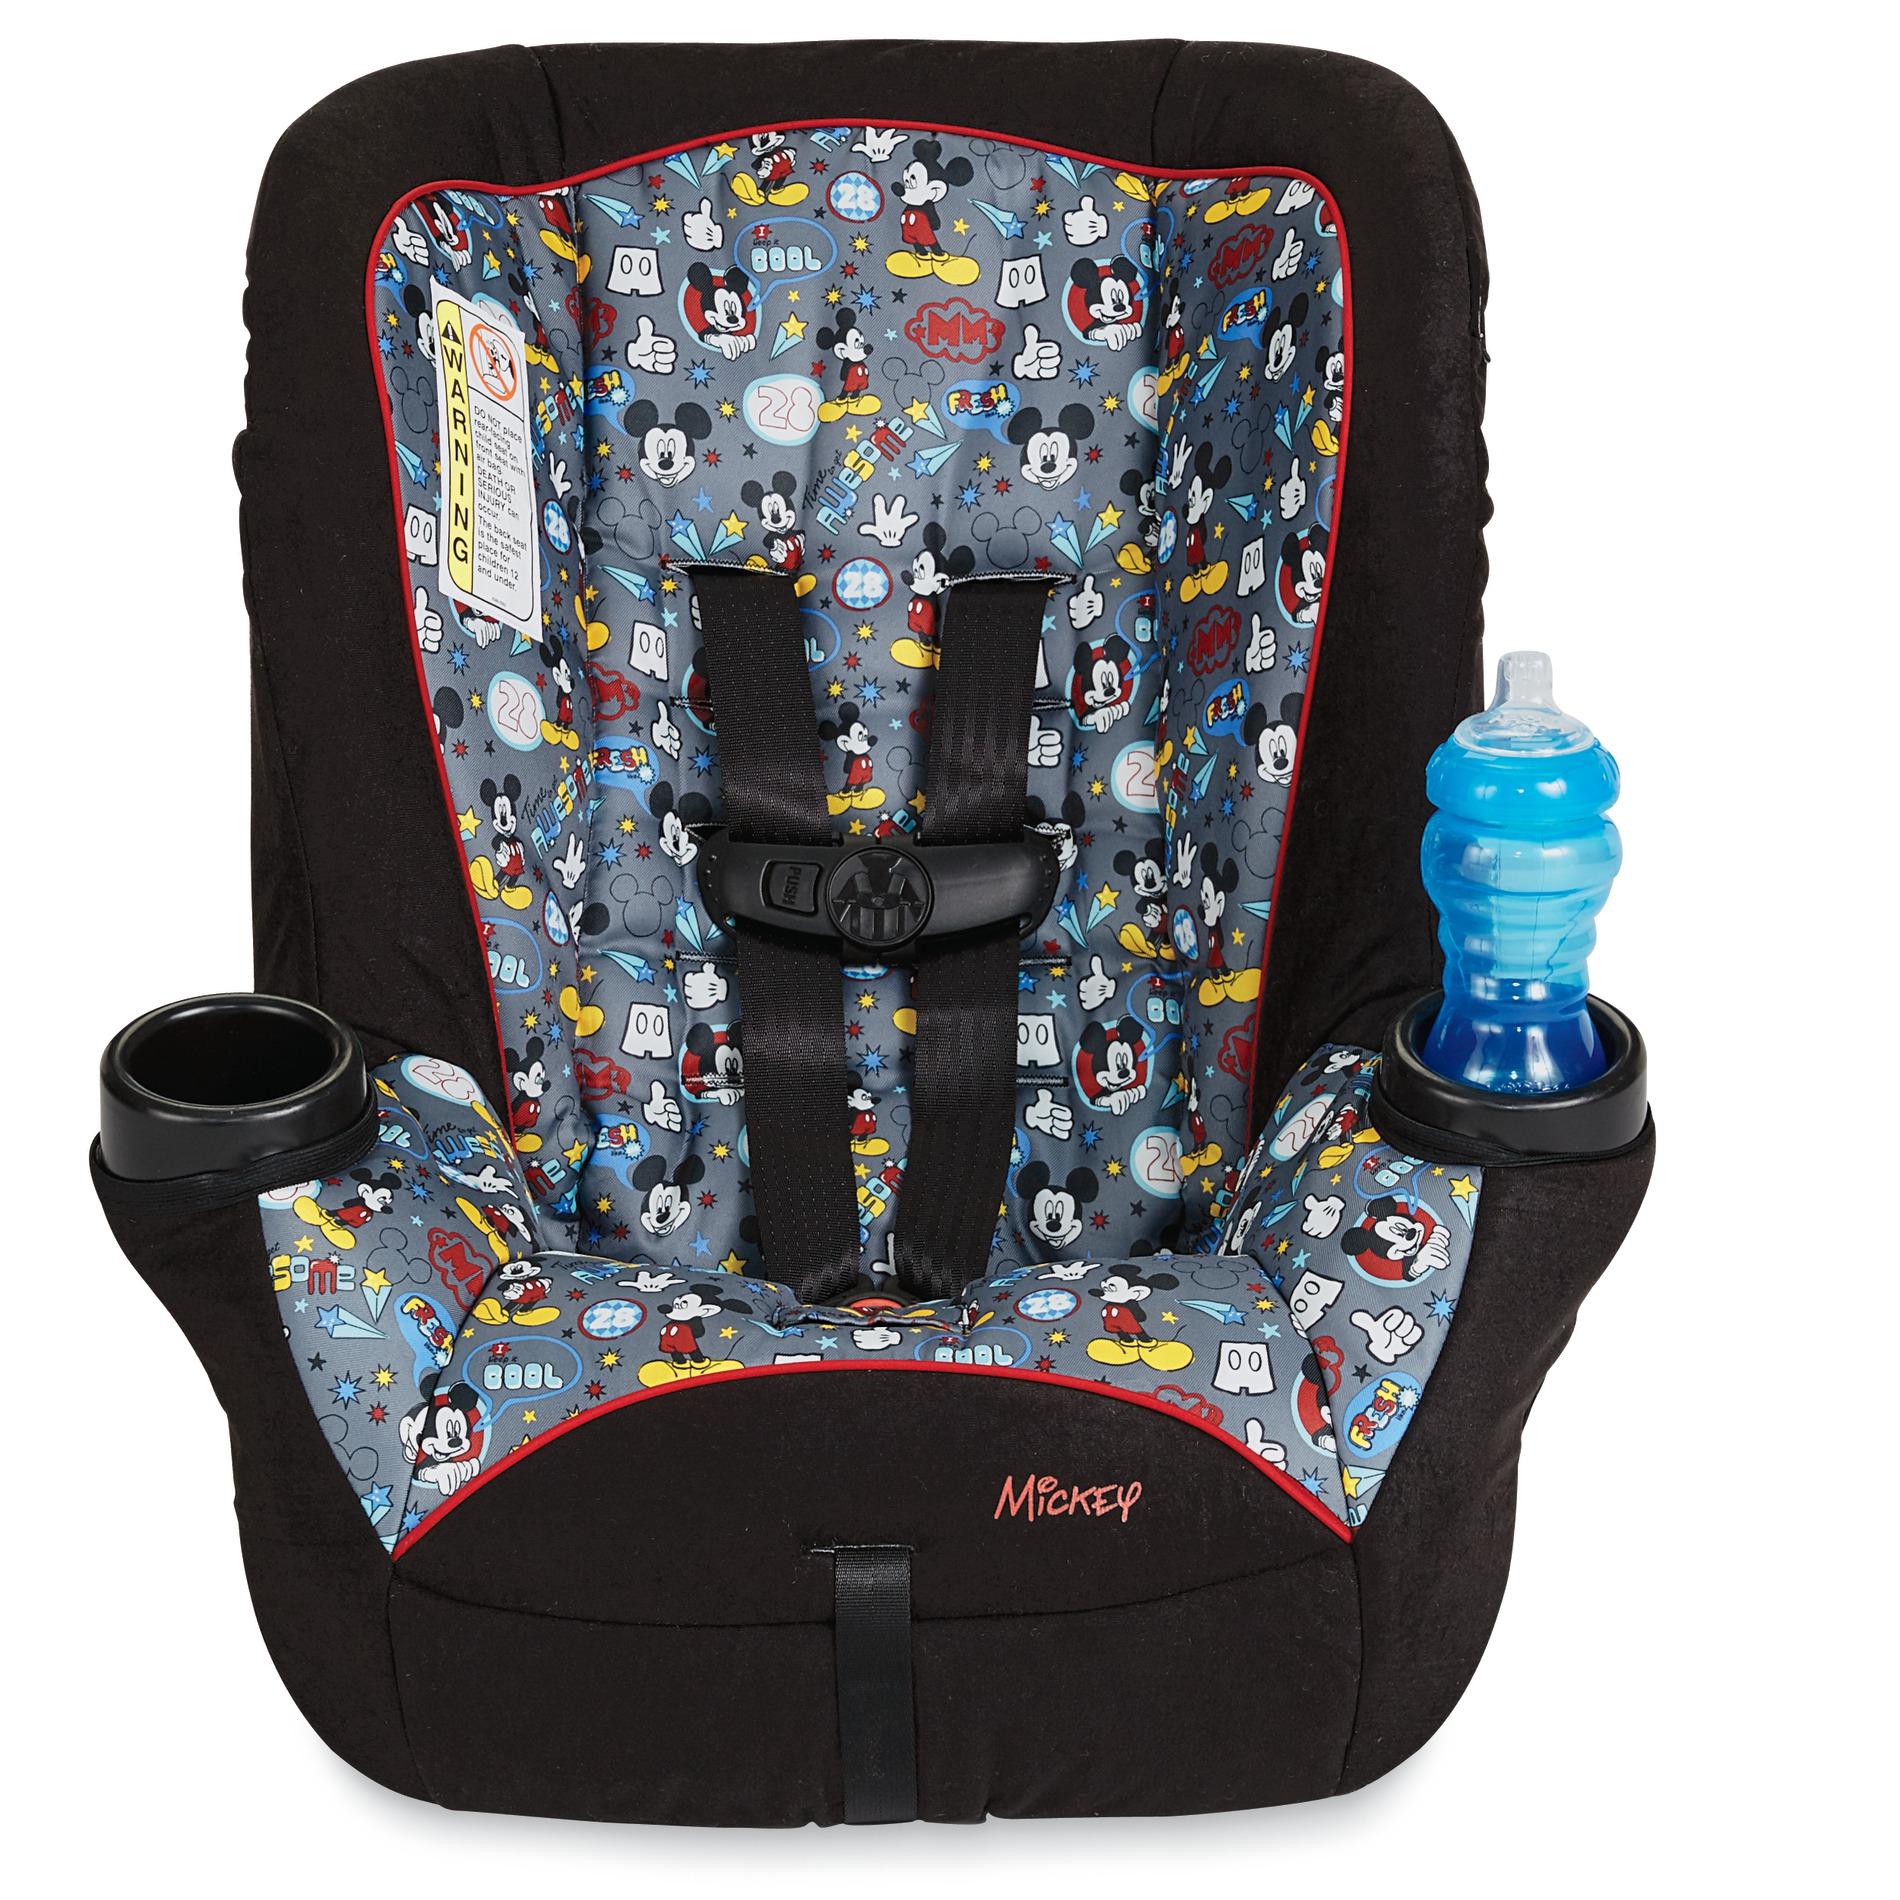 Disney Baby Mickey Mouse Apt Convertible Car Seat Baby Baby Car